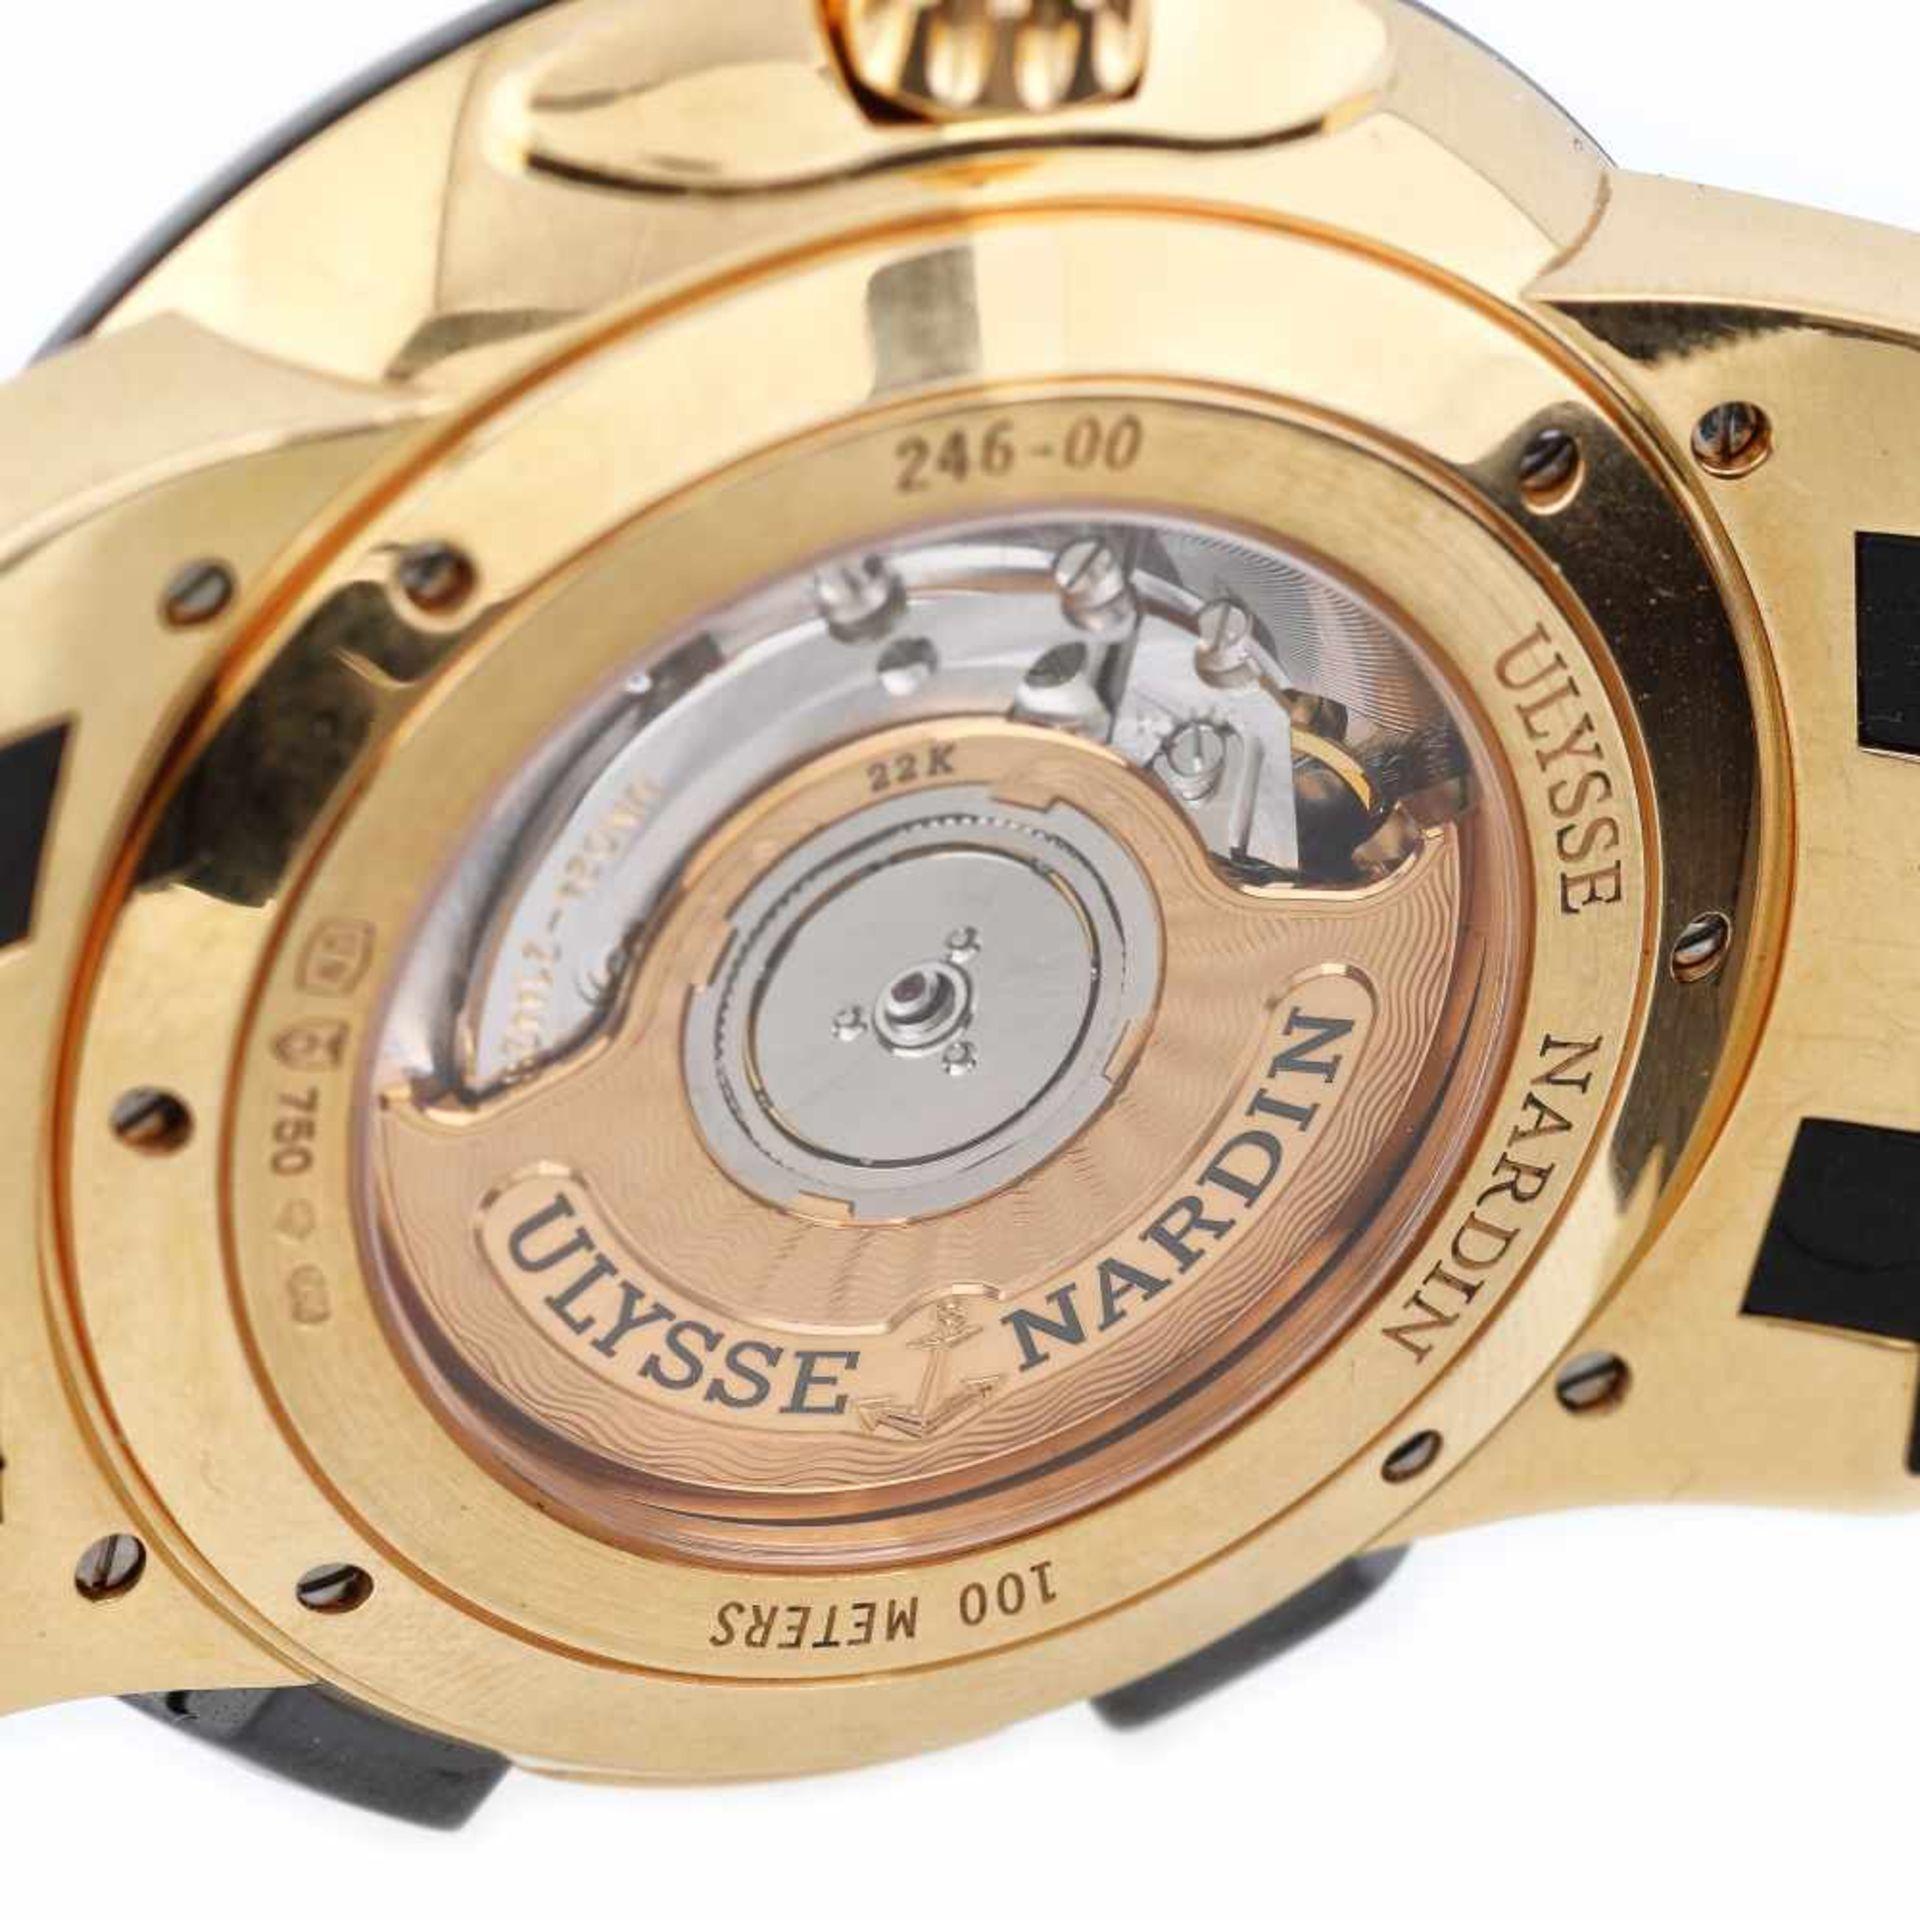 Ulysse Nardin Executive Dual Time wristwatch, rose gold, men, provenance documents - Bild 4 aus 4